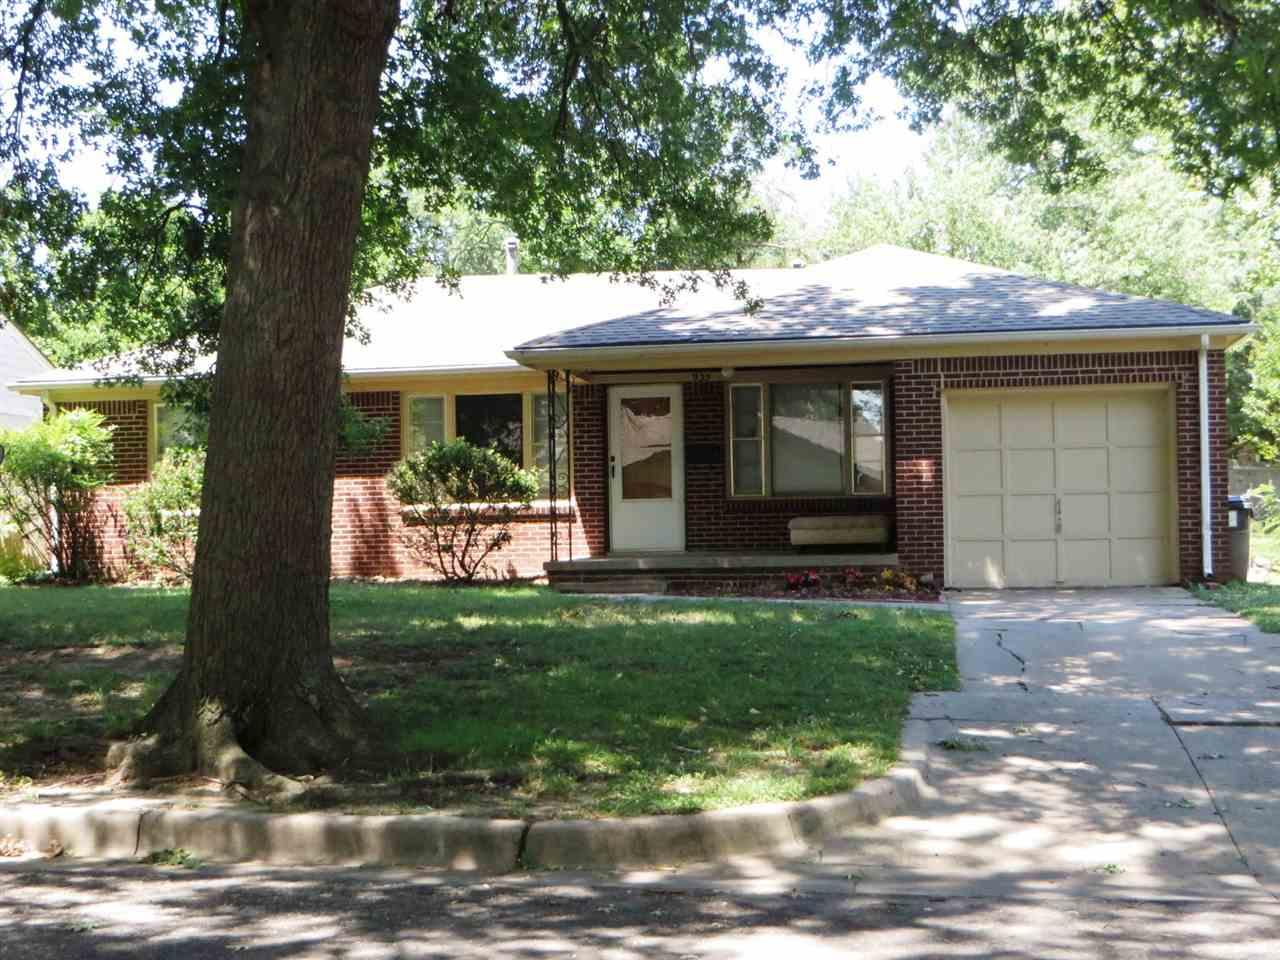 935 S Lexington Rd, Wichita, KS 67218